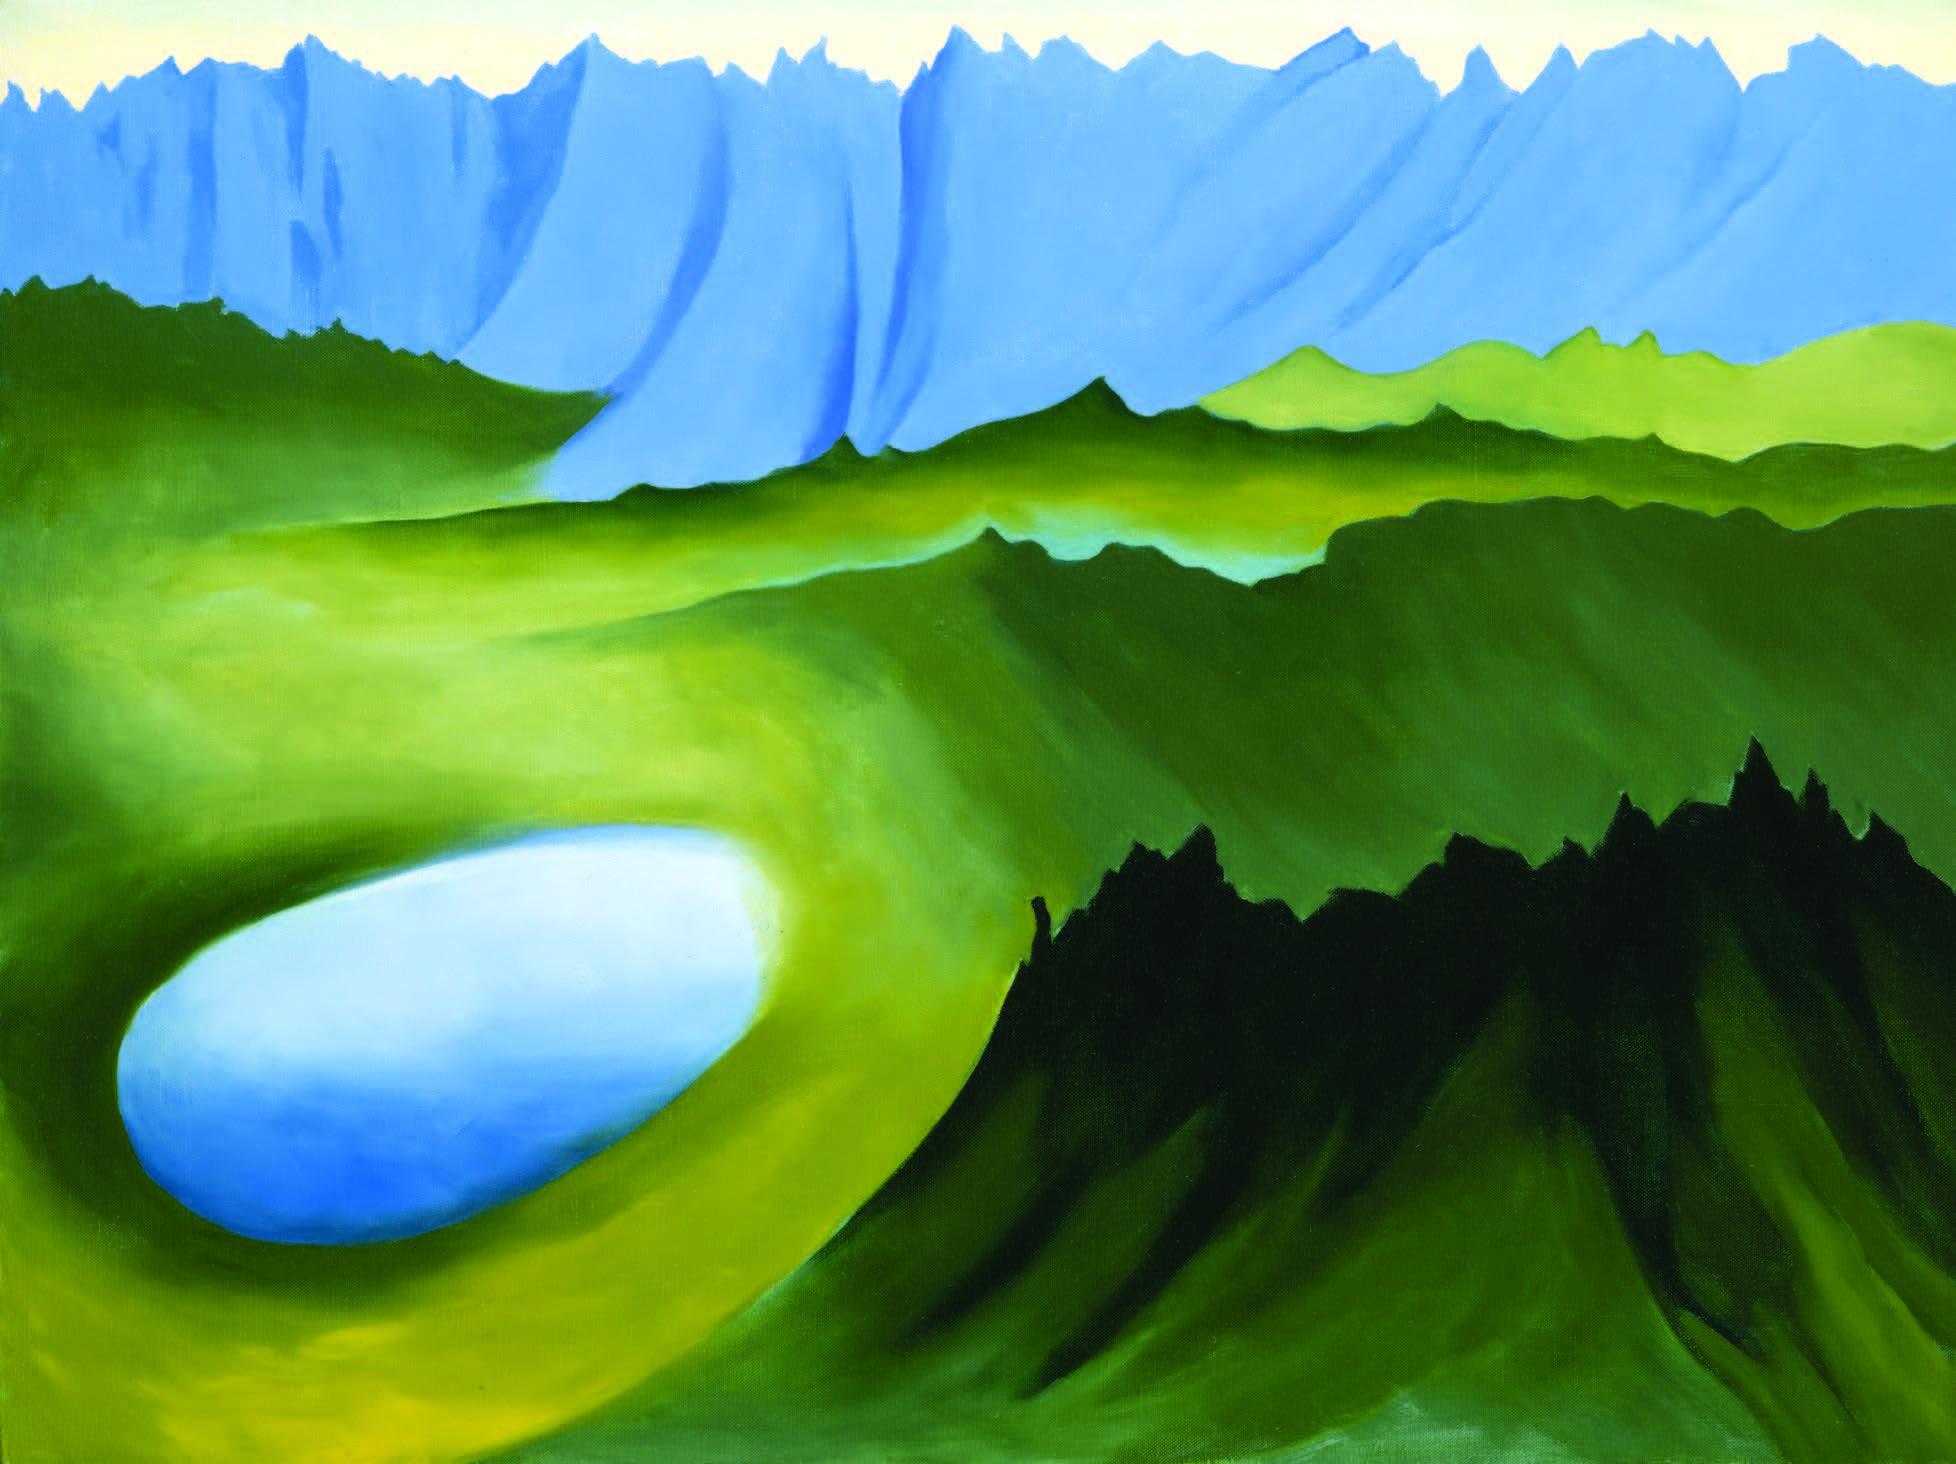 Georgia O'Keeffe, Mountains and Lake, 1961. Oil on canvas, 30 × 40 in. Georgia O'Keeffe Museum. Gift of the Georgia O'Keeffe Foundation (2006.05.365). © Georgia O'Keeffe Museum. Photograph by Malcolm Varon.